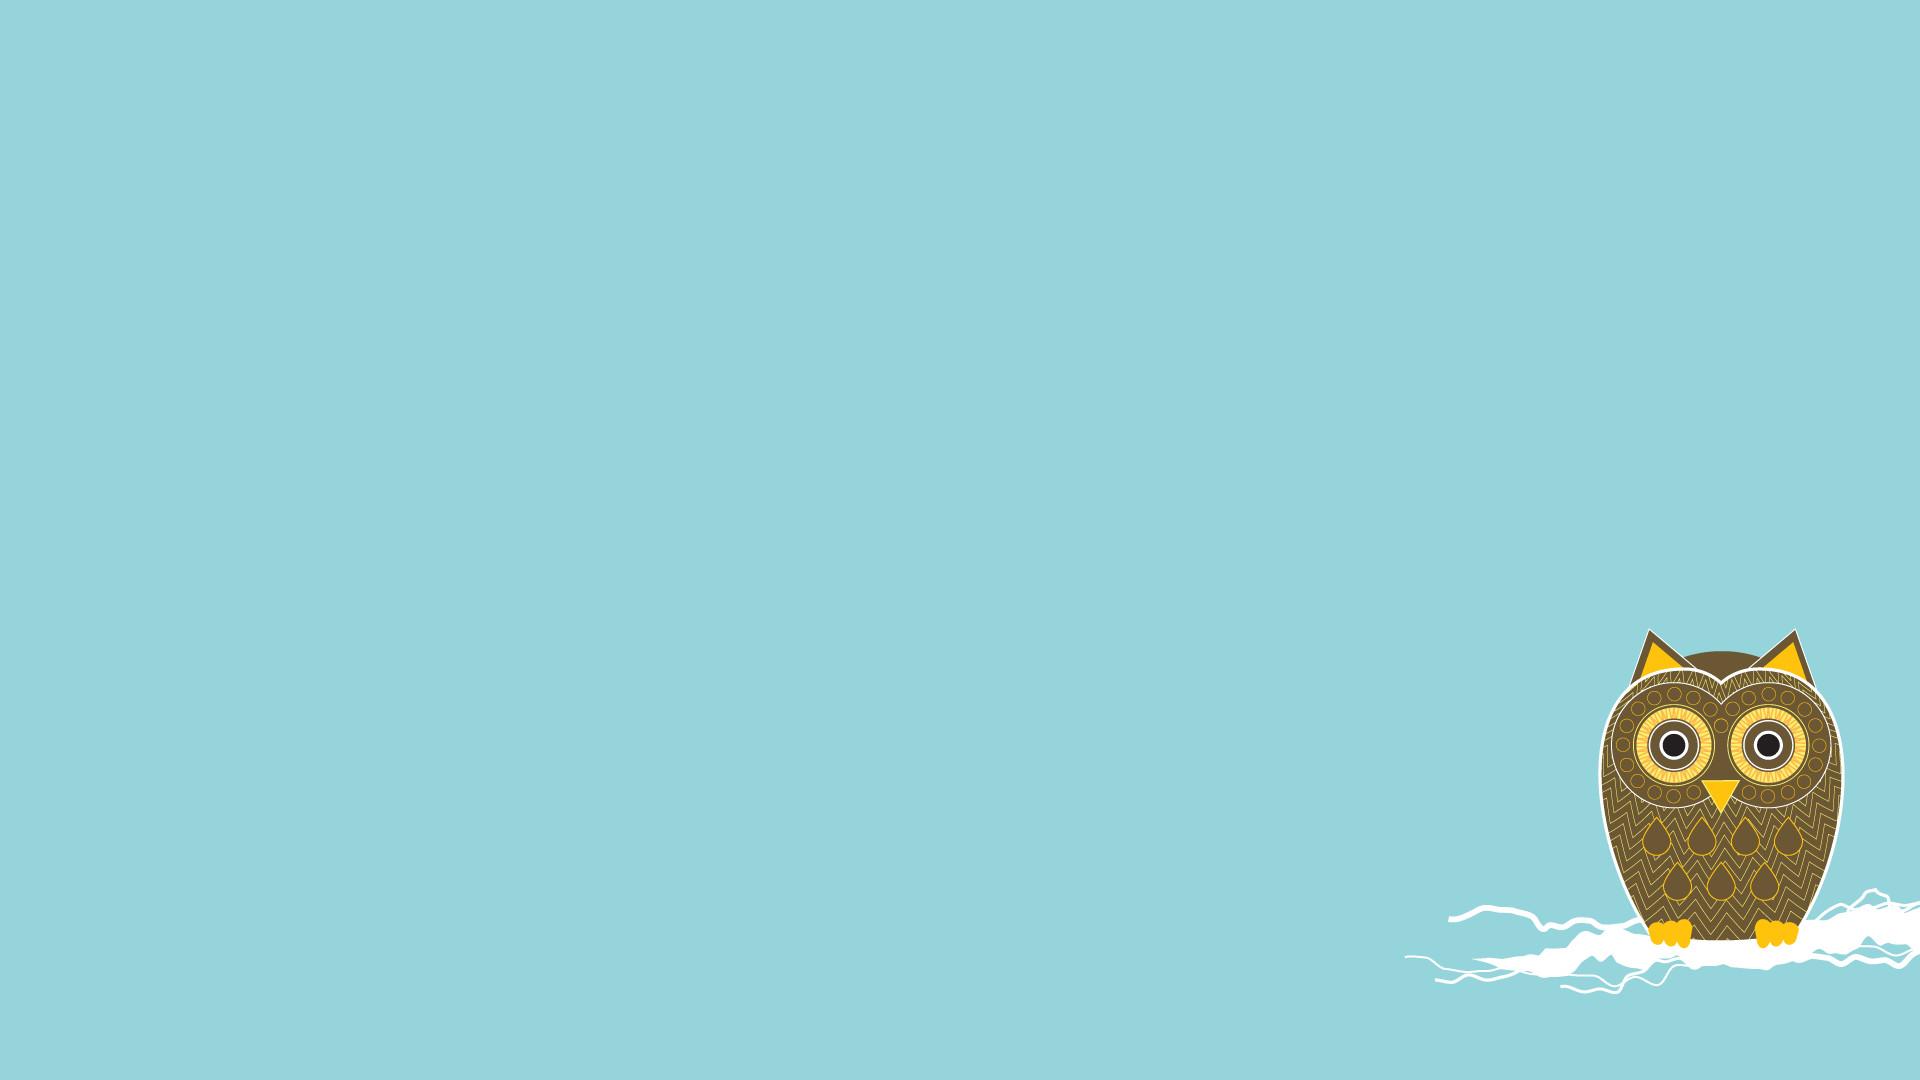 Cute Owl Wallpaper ·① WallpaperTag